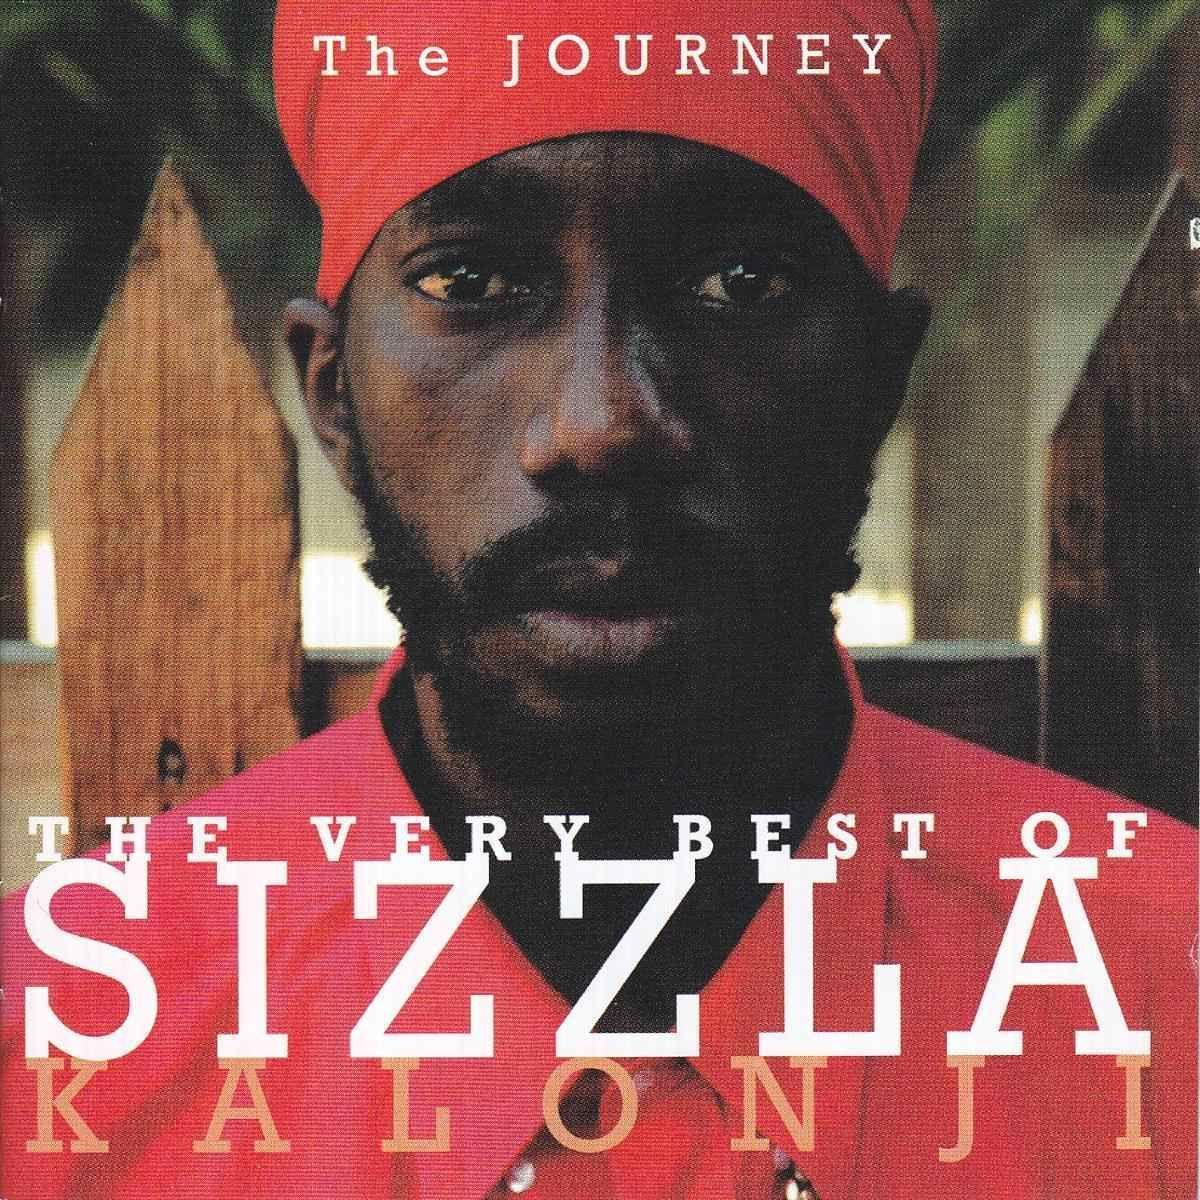 Africa Prepare By Sizzla Sizzla Kalonji Reggae Free Music Streaming